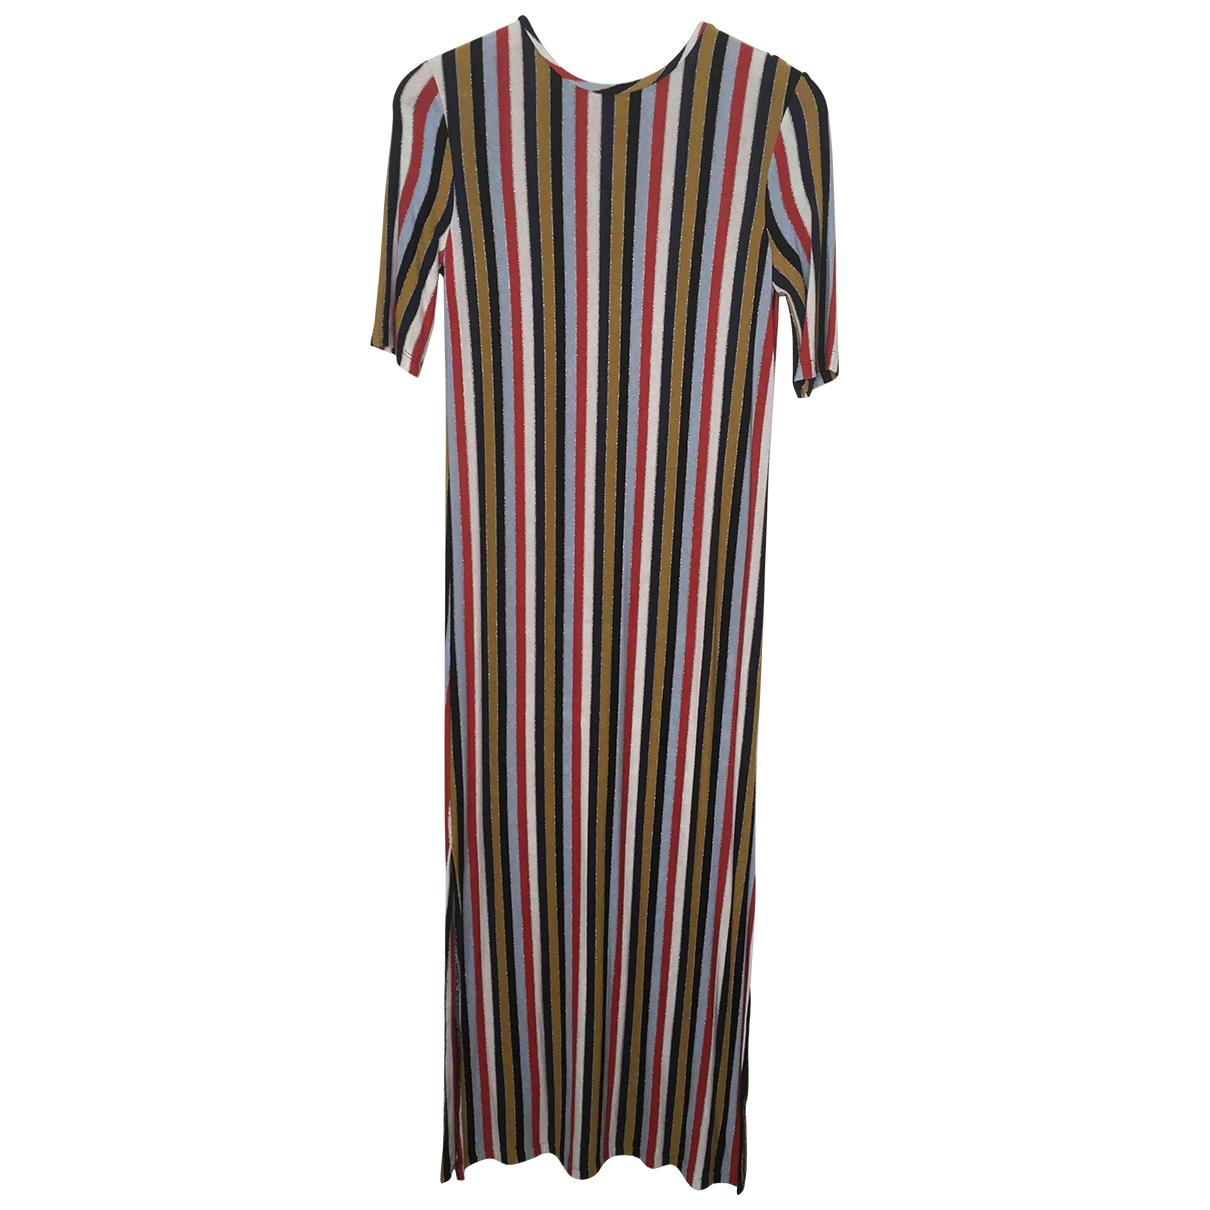 Zara \N Multicolour Cotton - elasthane dress for Women S International